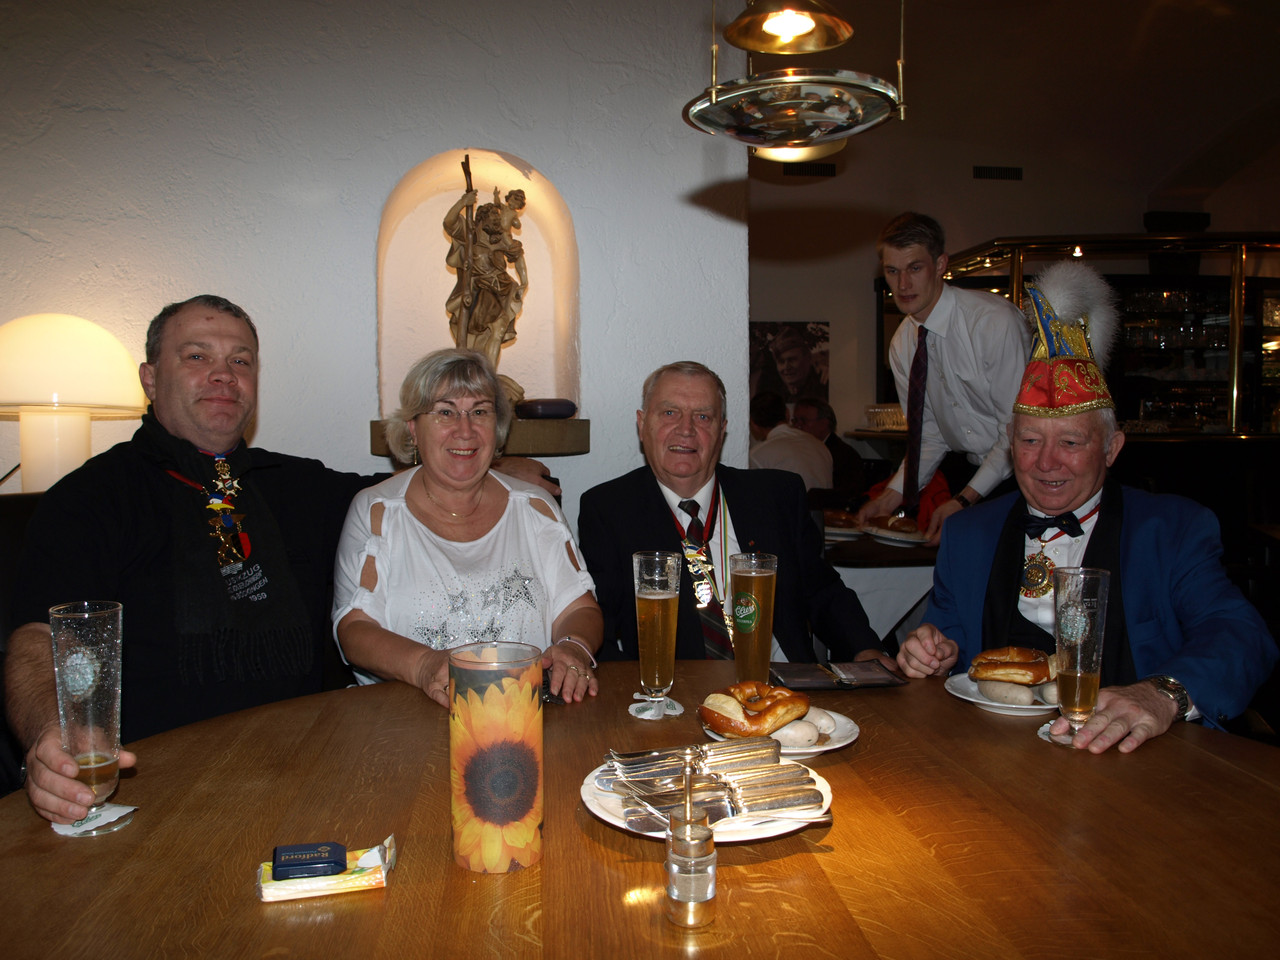 11.11. 2012 Faschingsbeginn Heilbronn Ratskeller